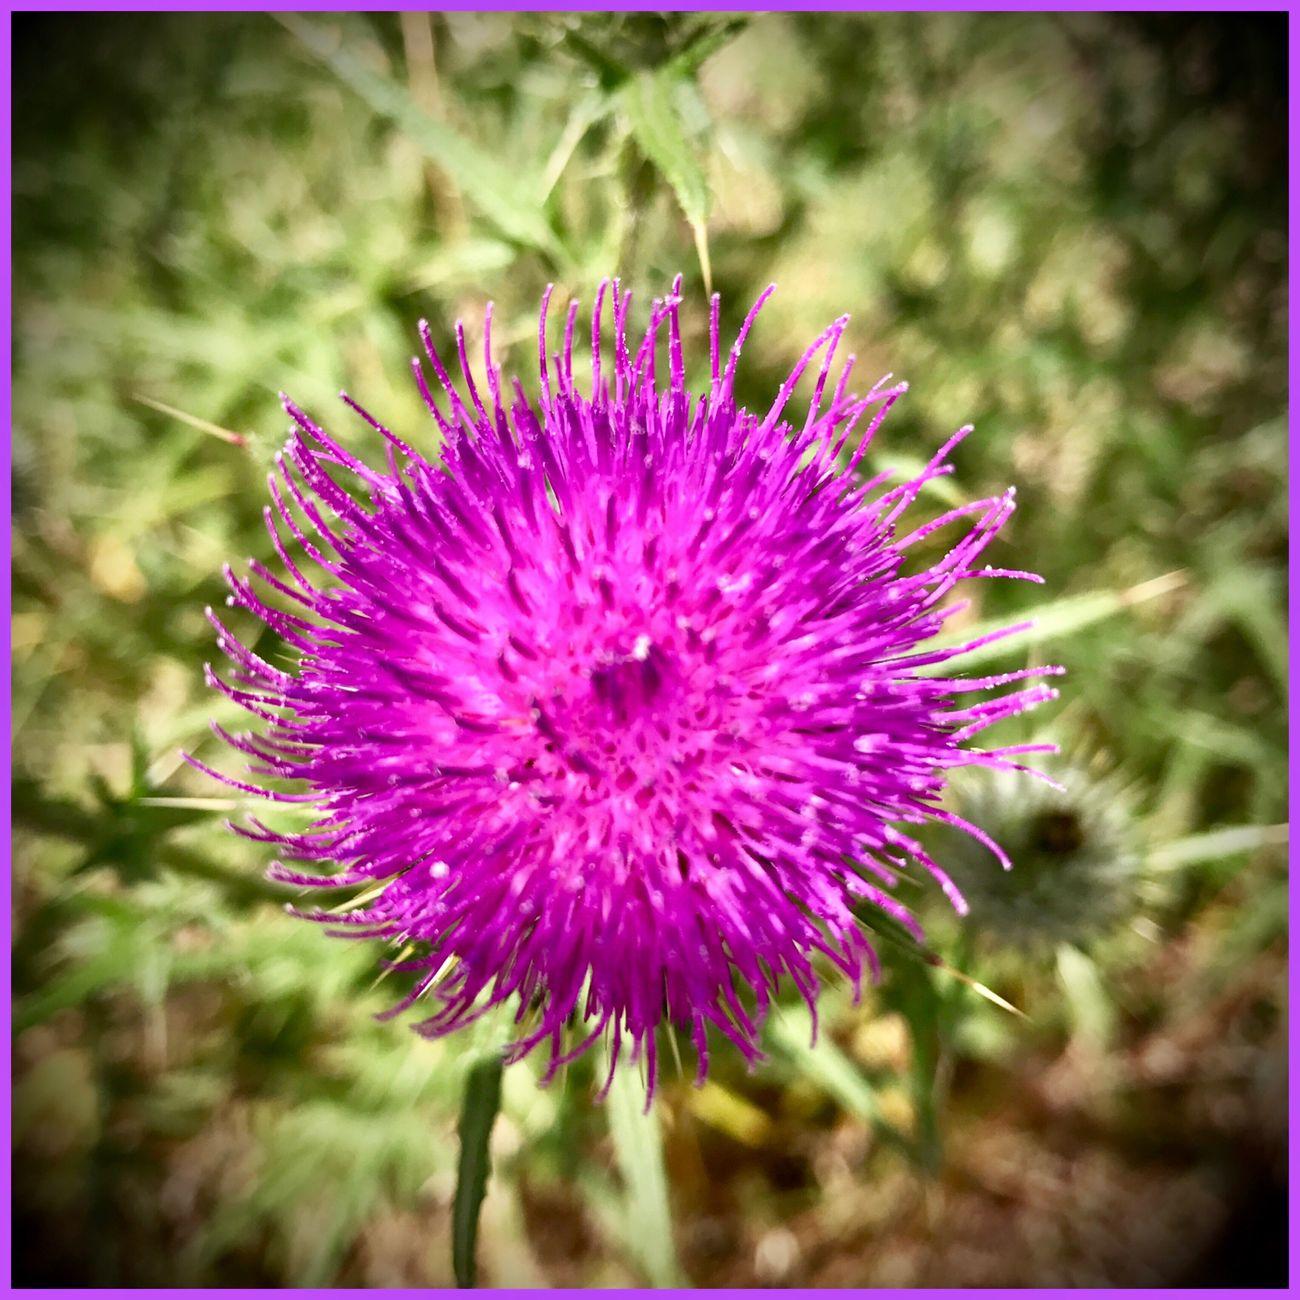 Flower 🍃🌷🍂 Flower Plant Prickle Nature Eyeemcollection MyPhotography Pink Pretty Sidewalkflower 🍃🌷🍂